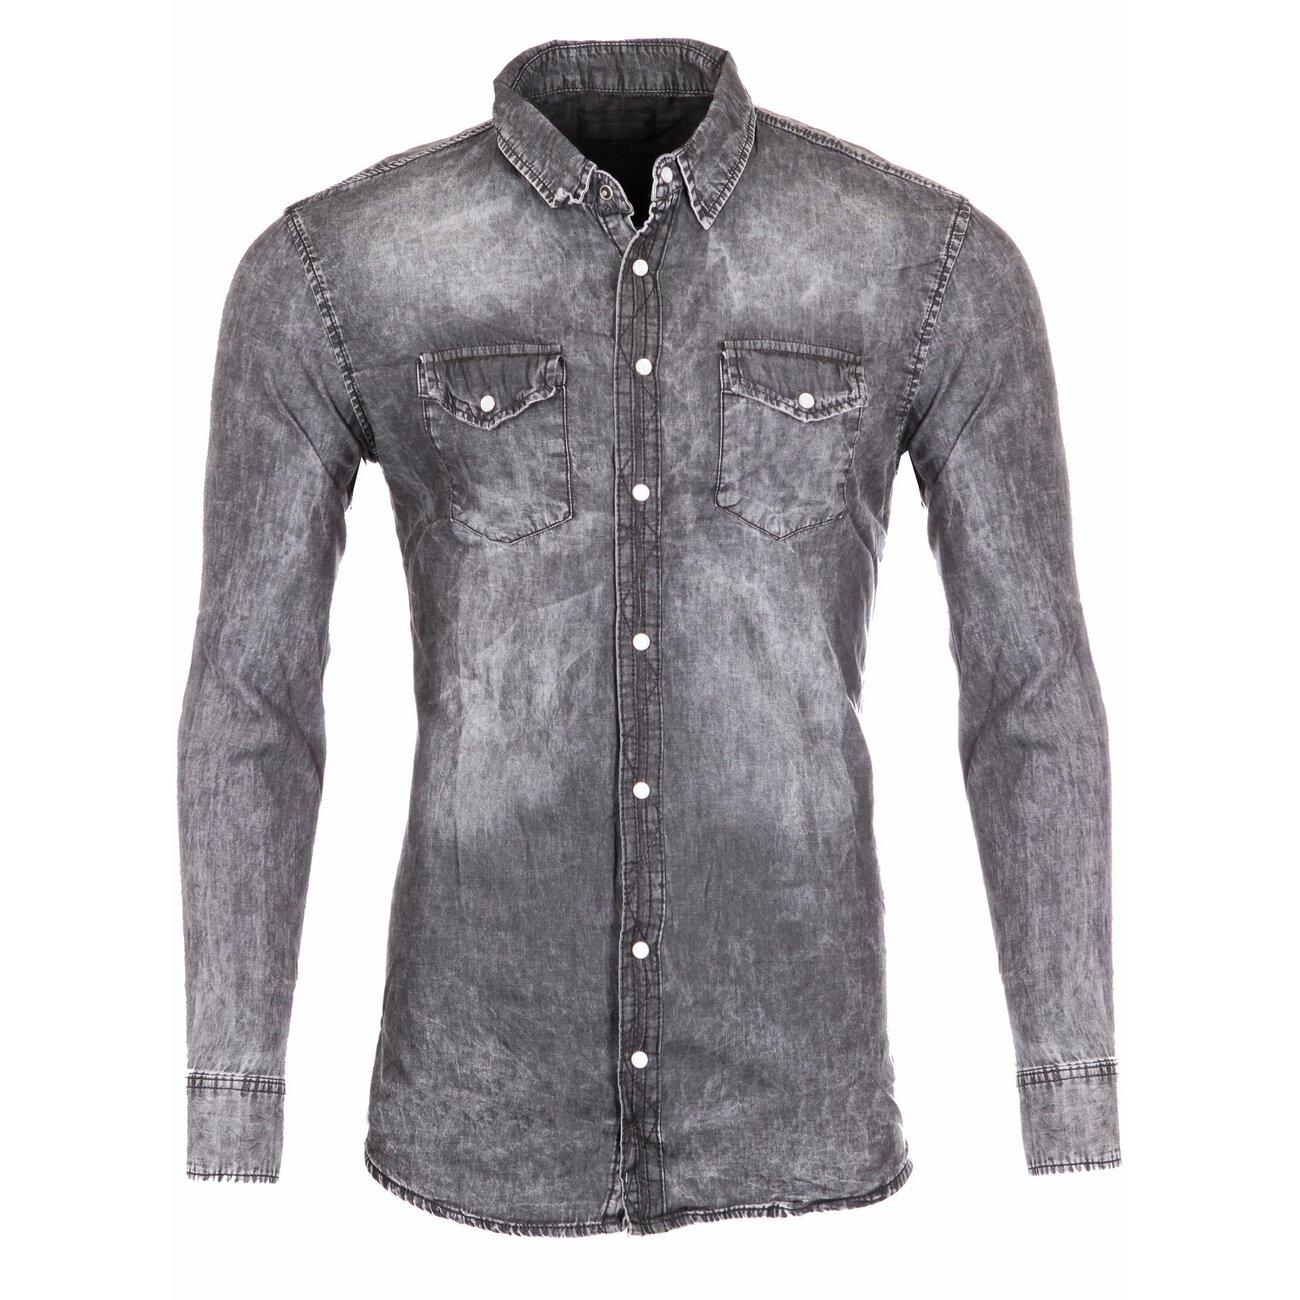 jeanshemd grau   reslad rs-7302   hemden günstig